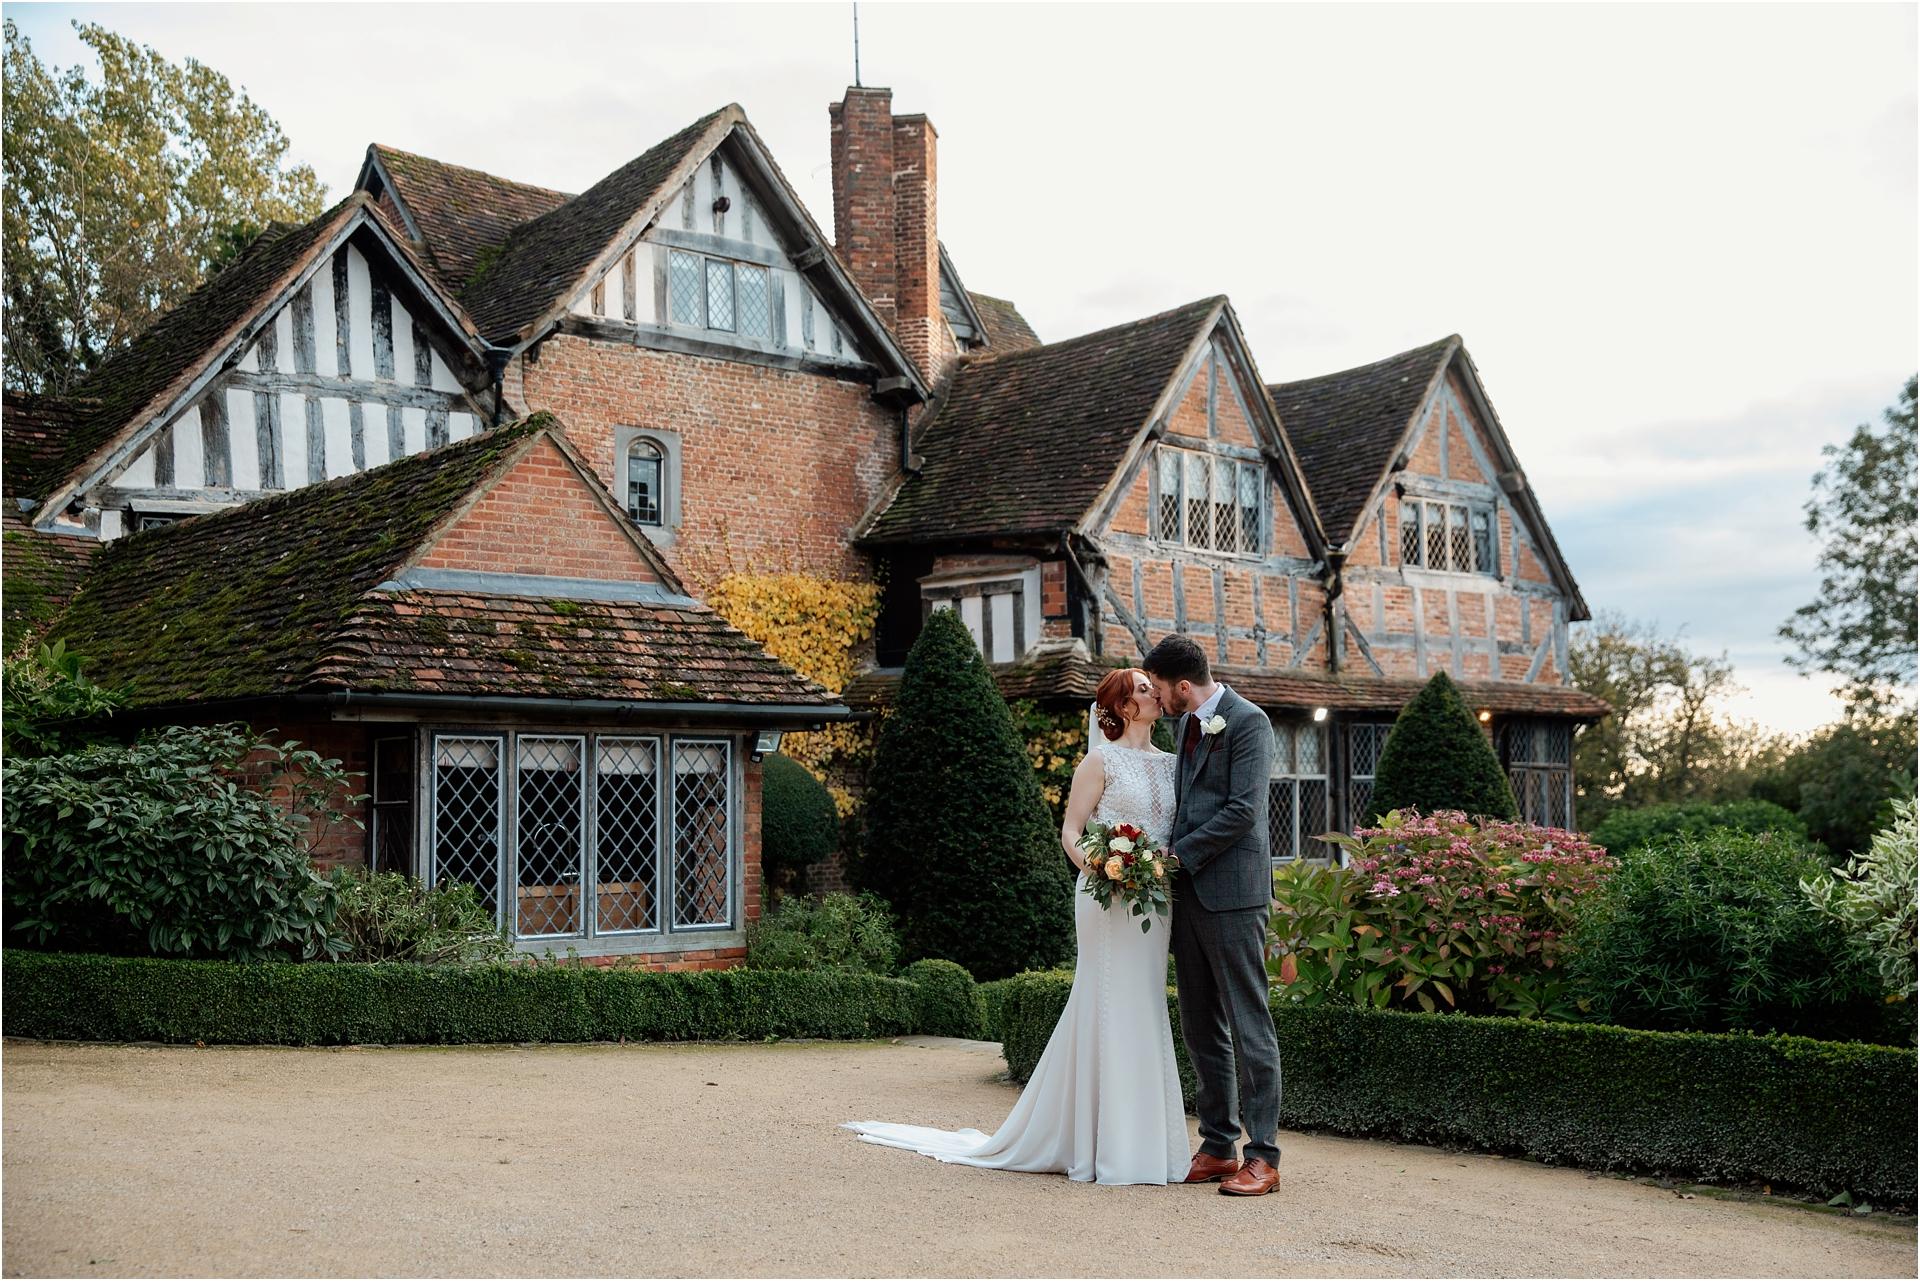 Gorcott Hall wedding photography